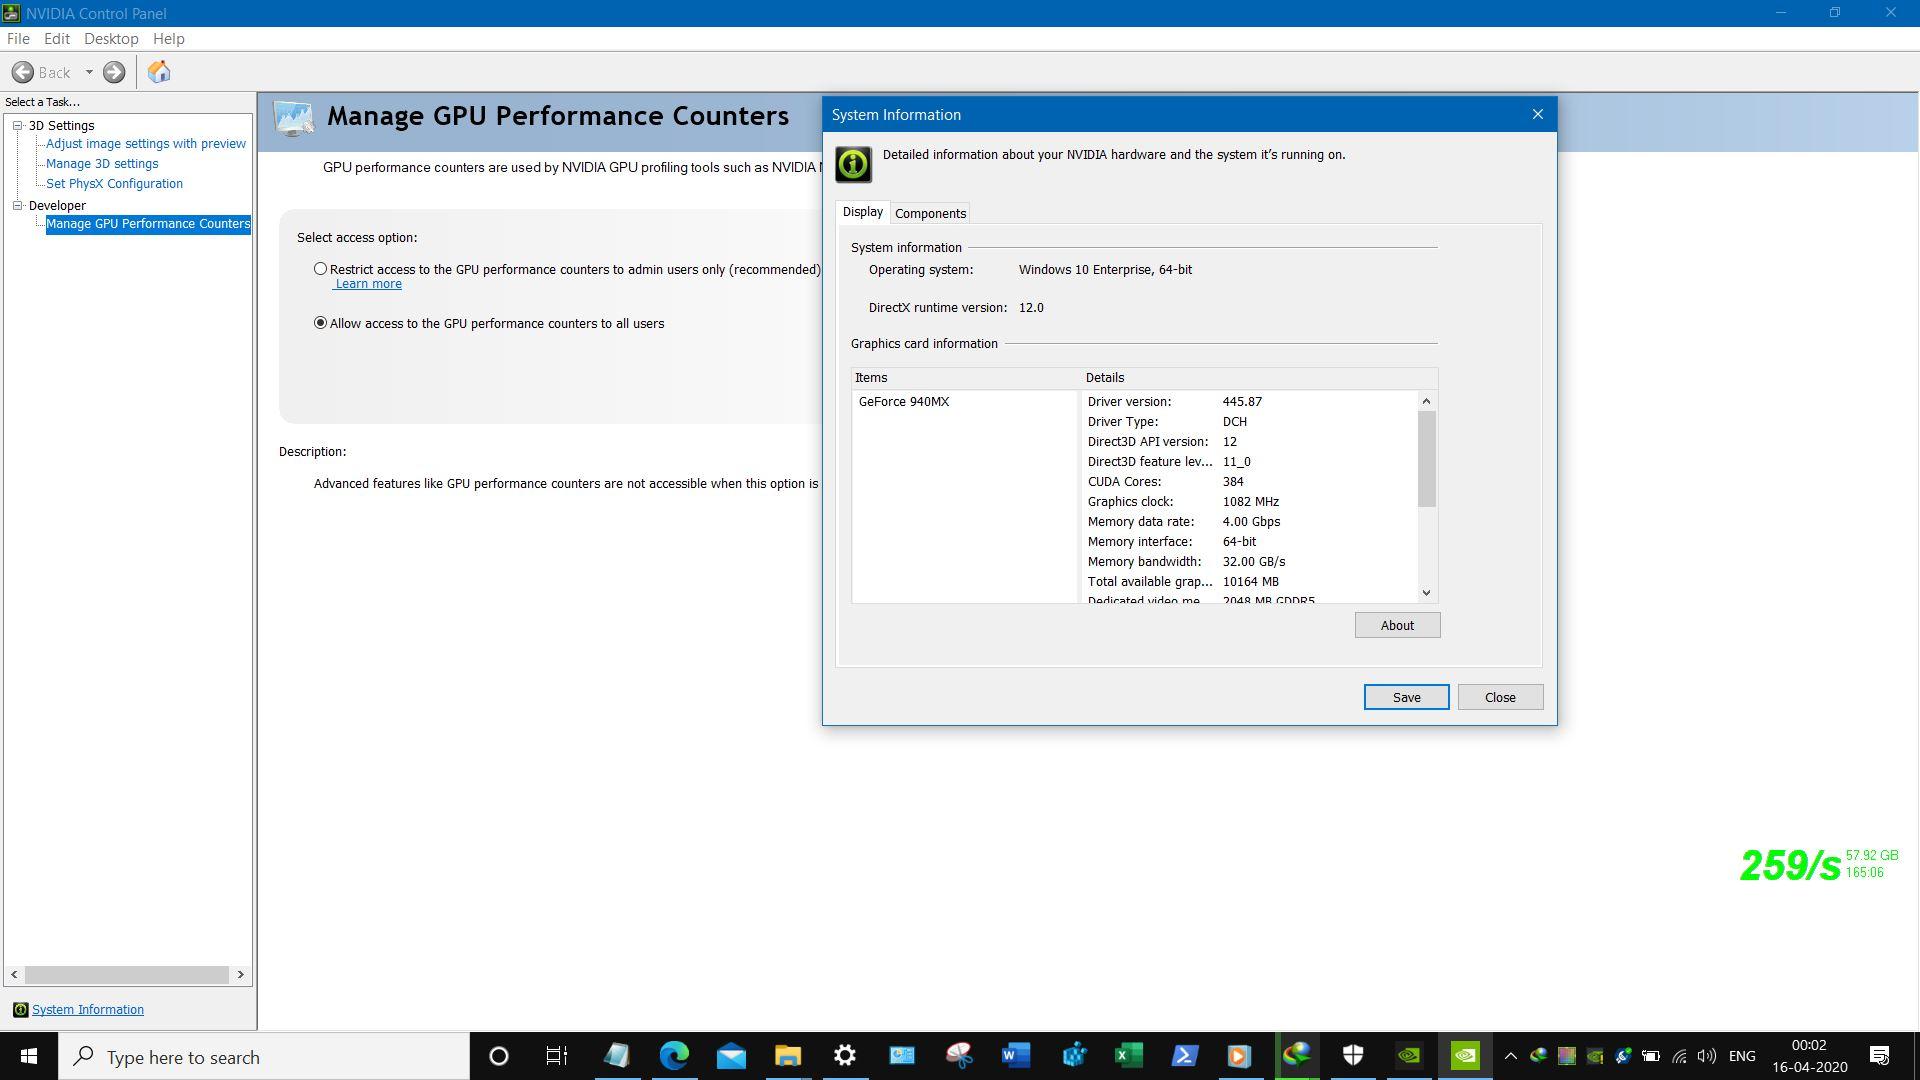 Nvidia Inc Released new Geforce DCH & STANDARD WHQL Driver v445.87 for Notebooks GPU'S &... 6484b2f8-6a65-4bcb-b0fc-83a6f89135a0?upload=true.jpg